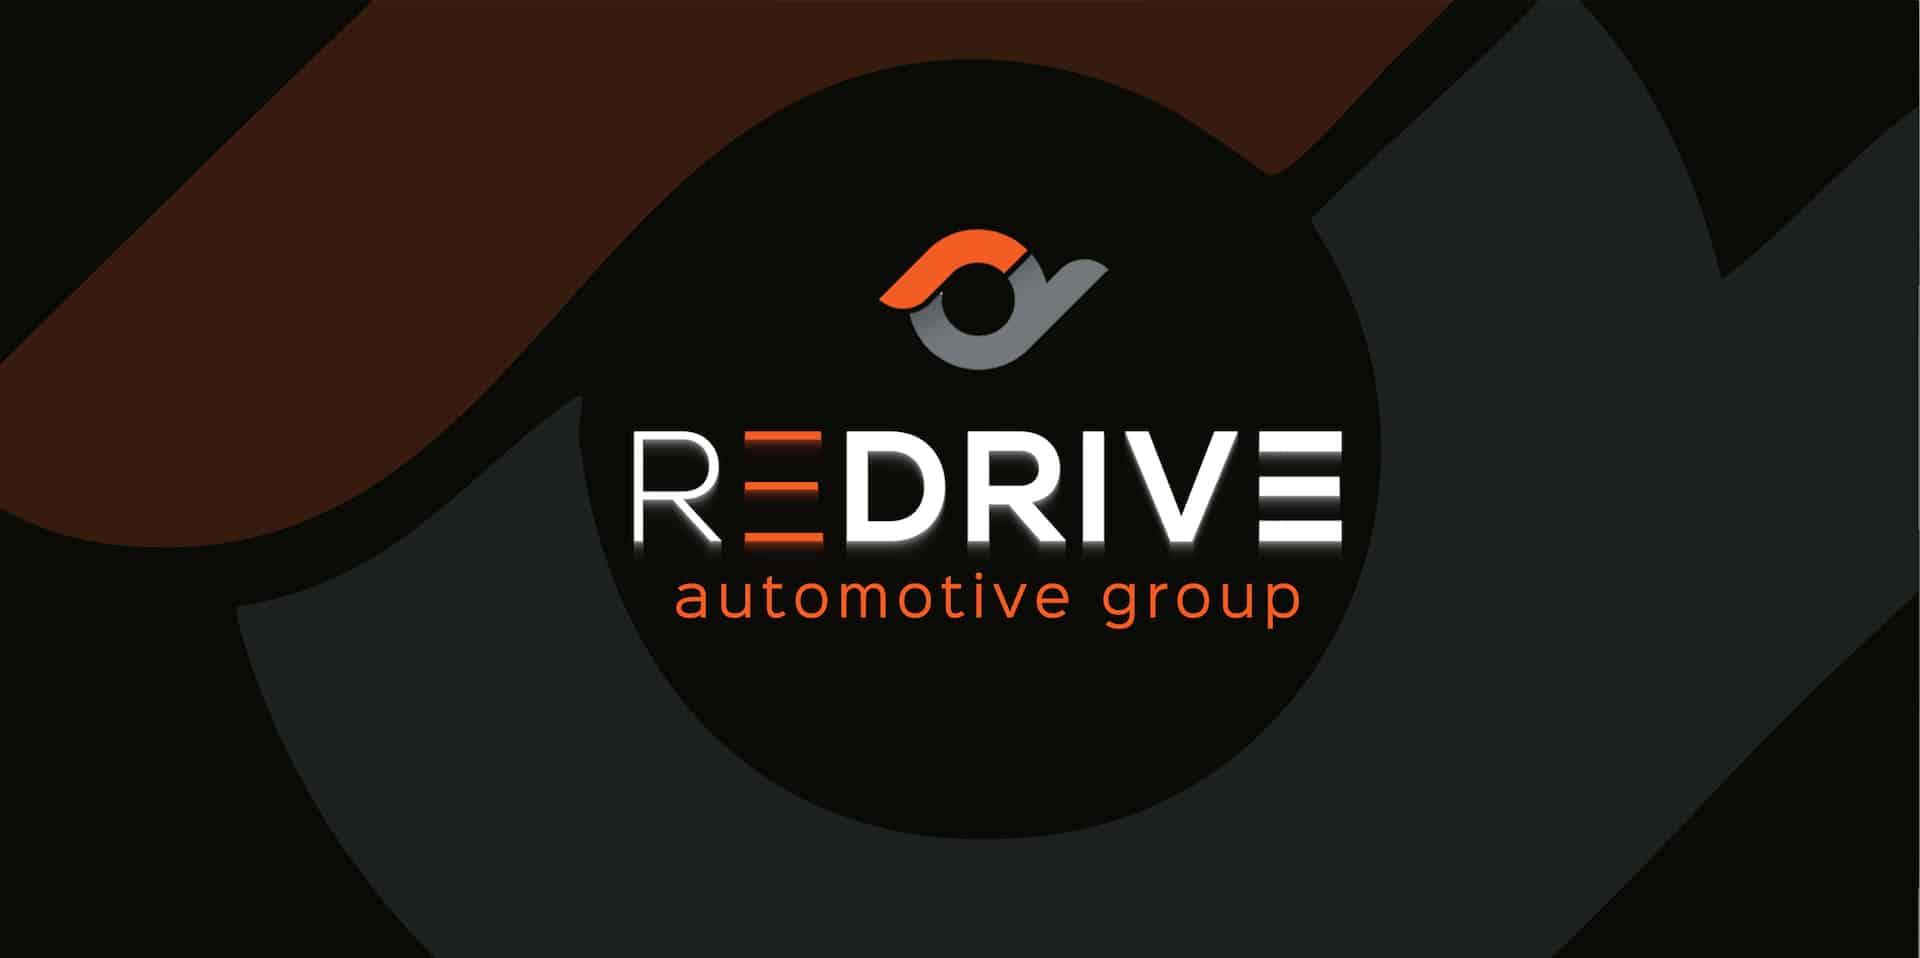 REDrive Automotive